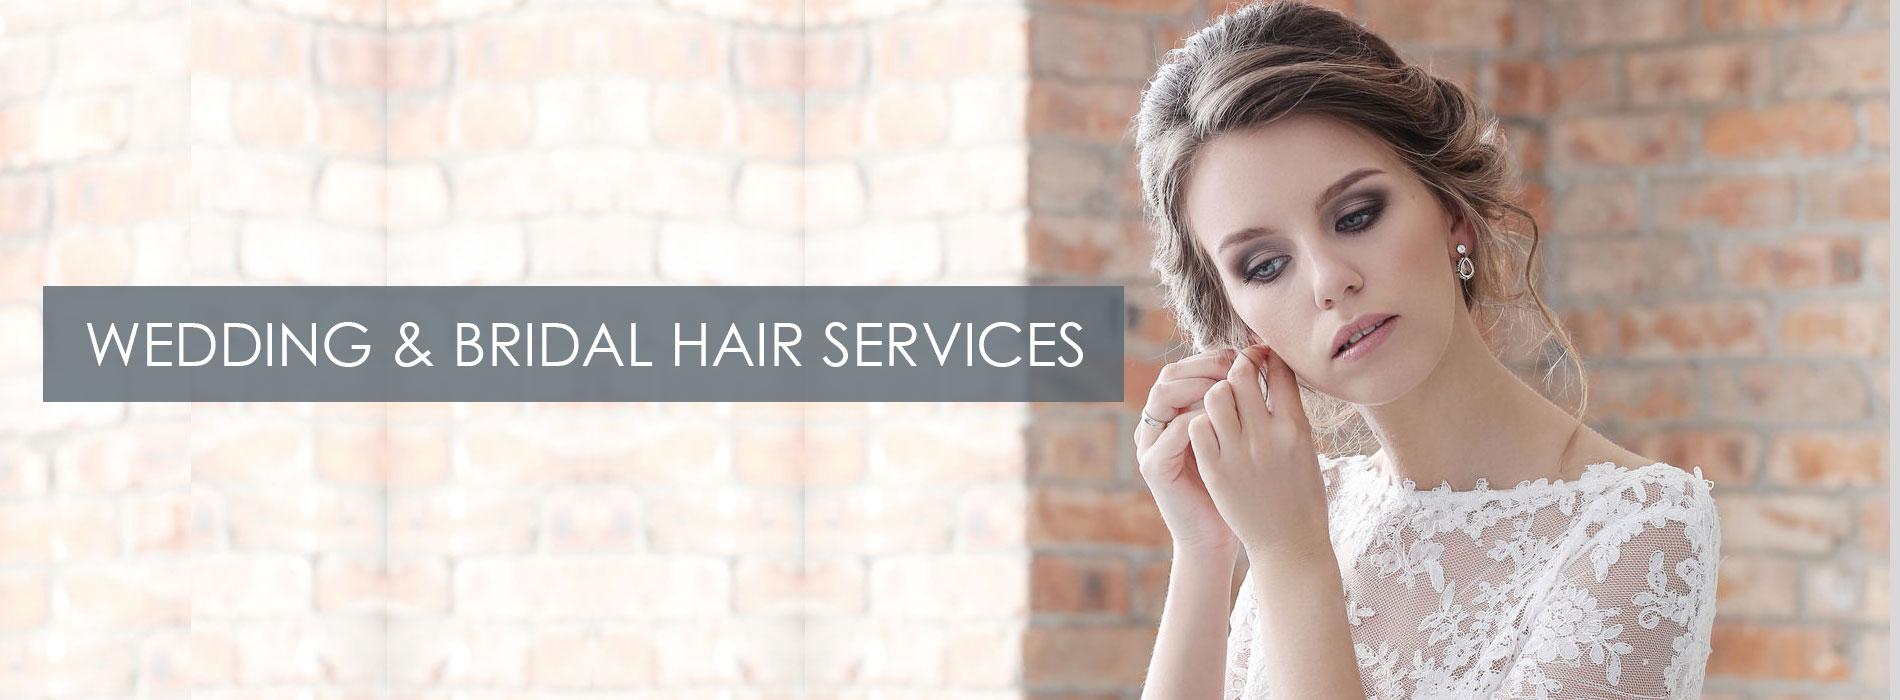 Wedding-&-Bridal-Hair-Services